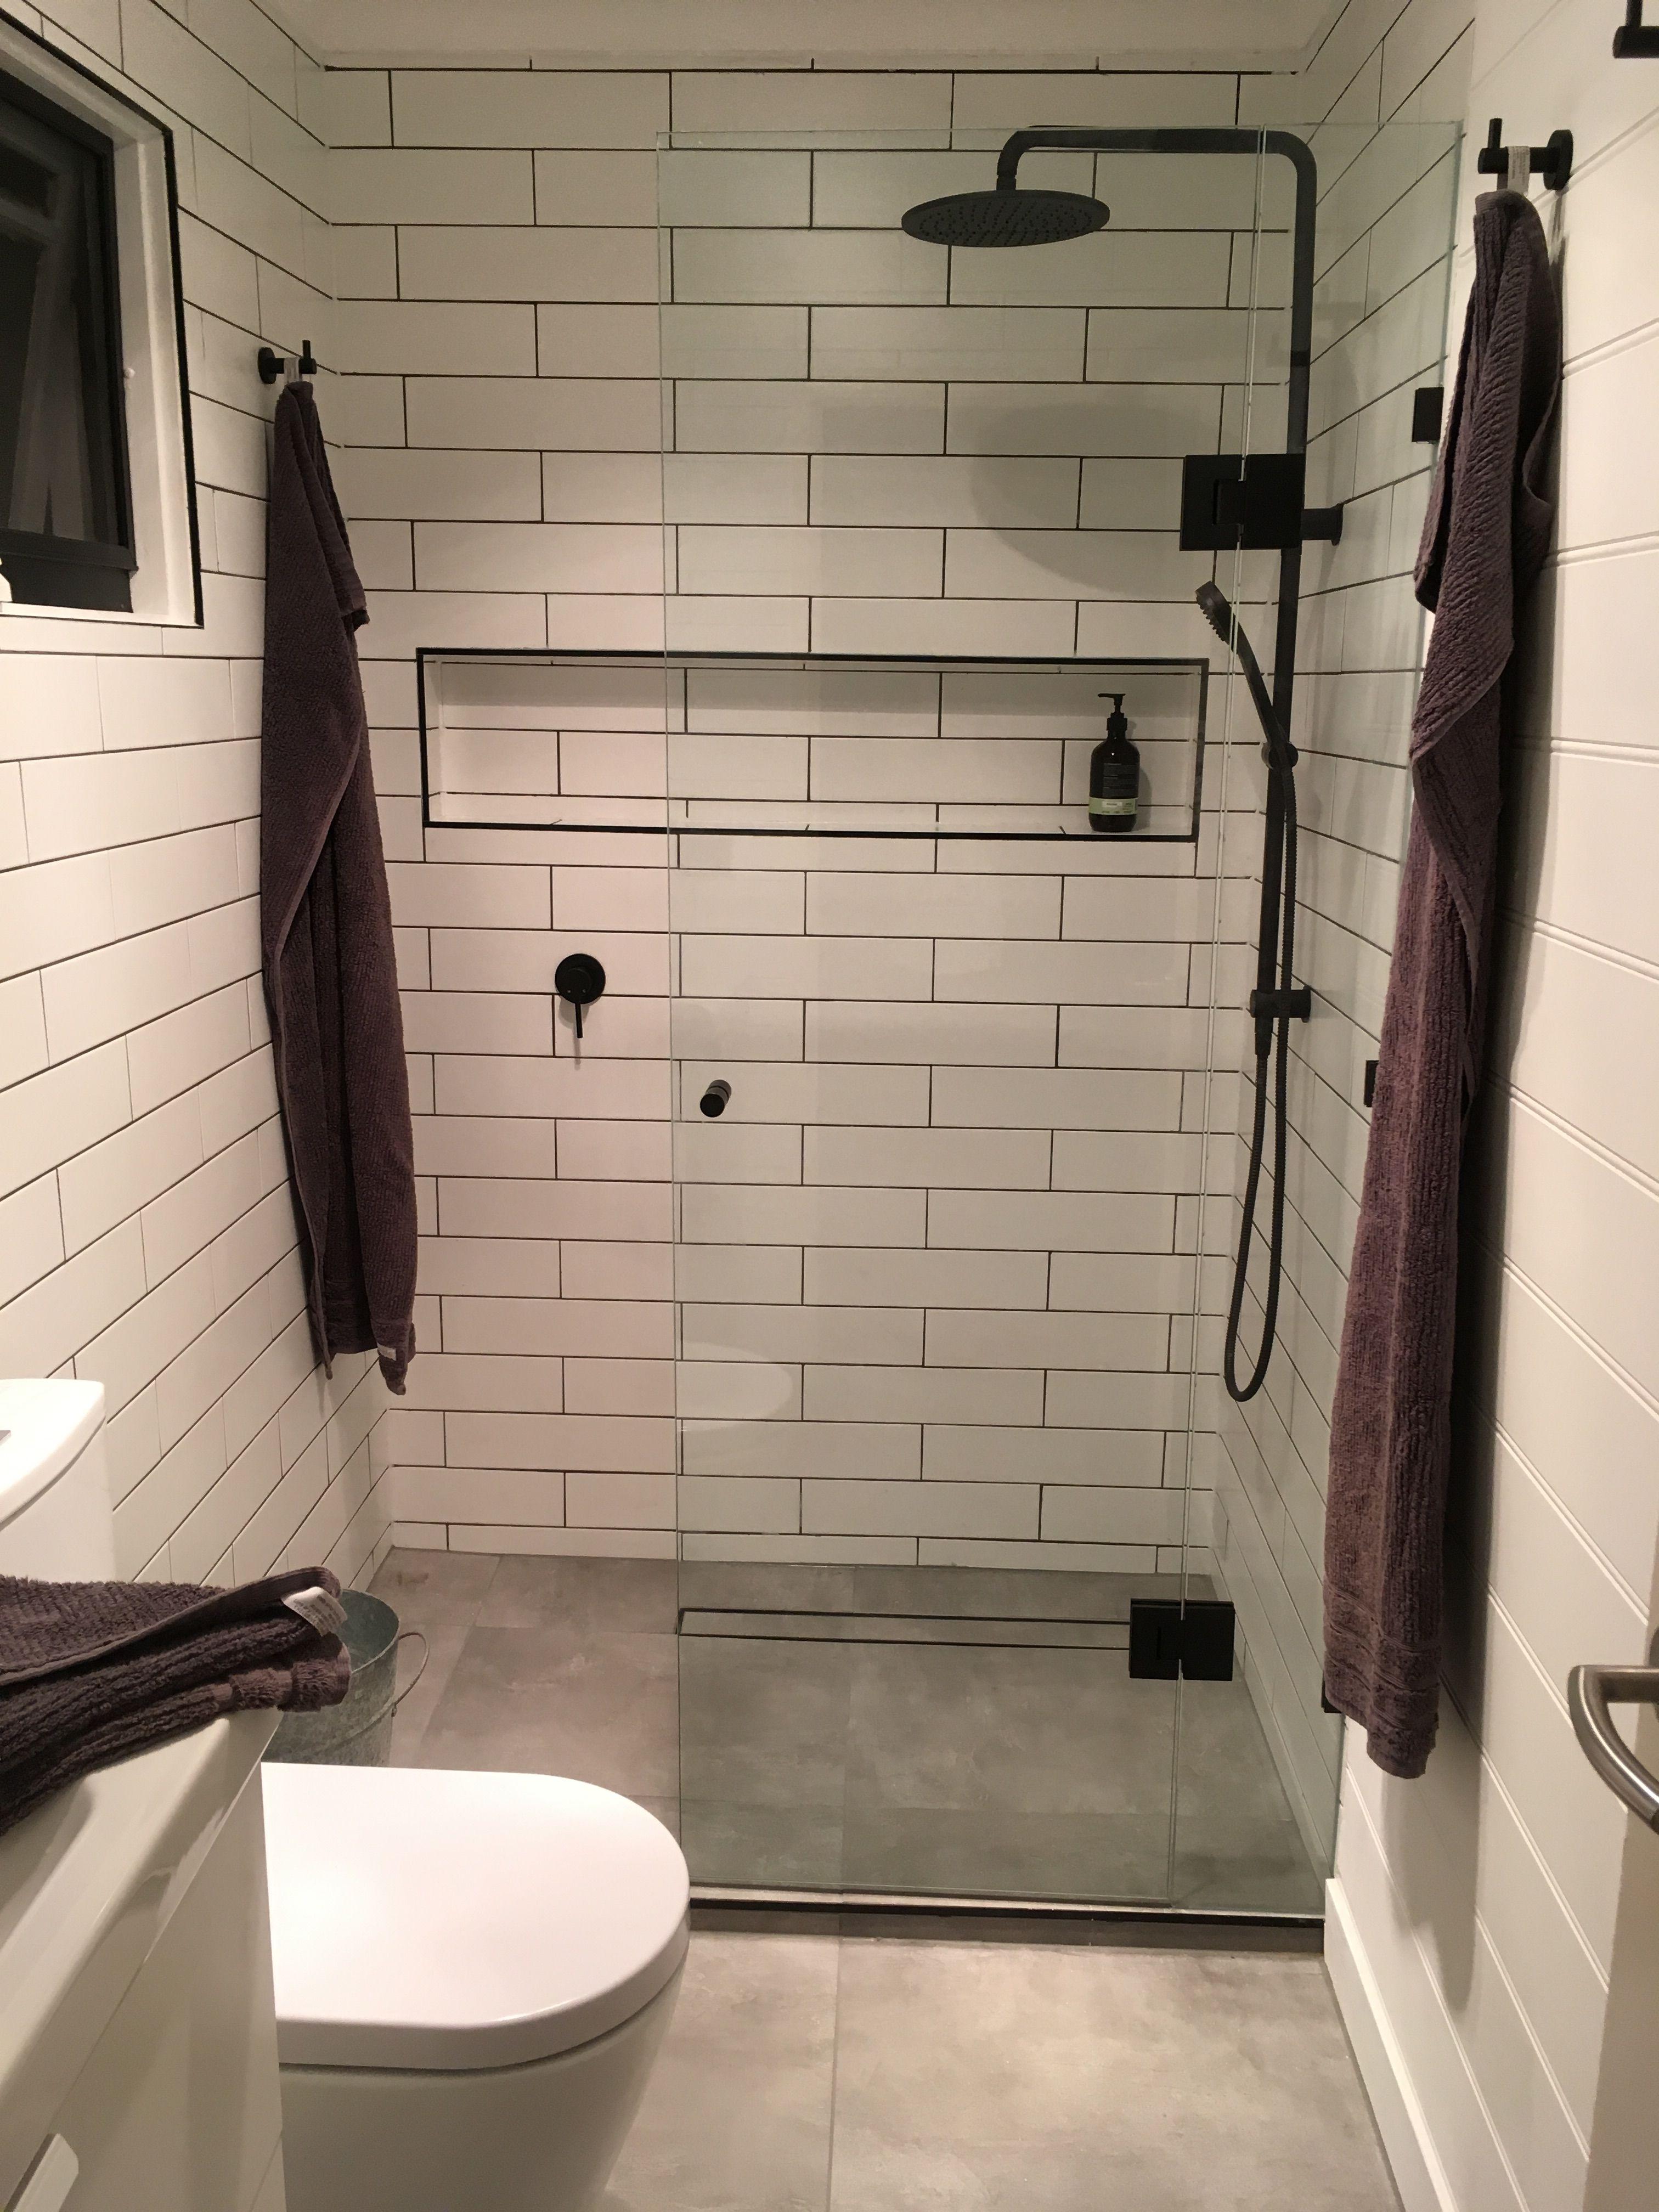 Small Bathroom Ensuite Reno Black And White Subway Tile Small Bathroom Renos Bathroom Renos Small Bathroom